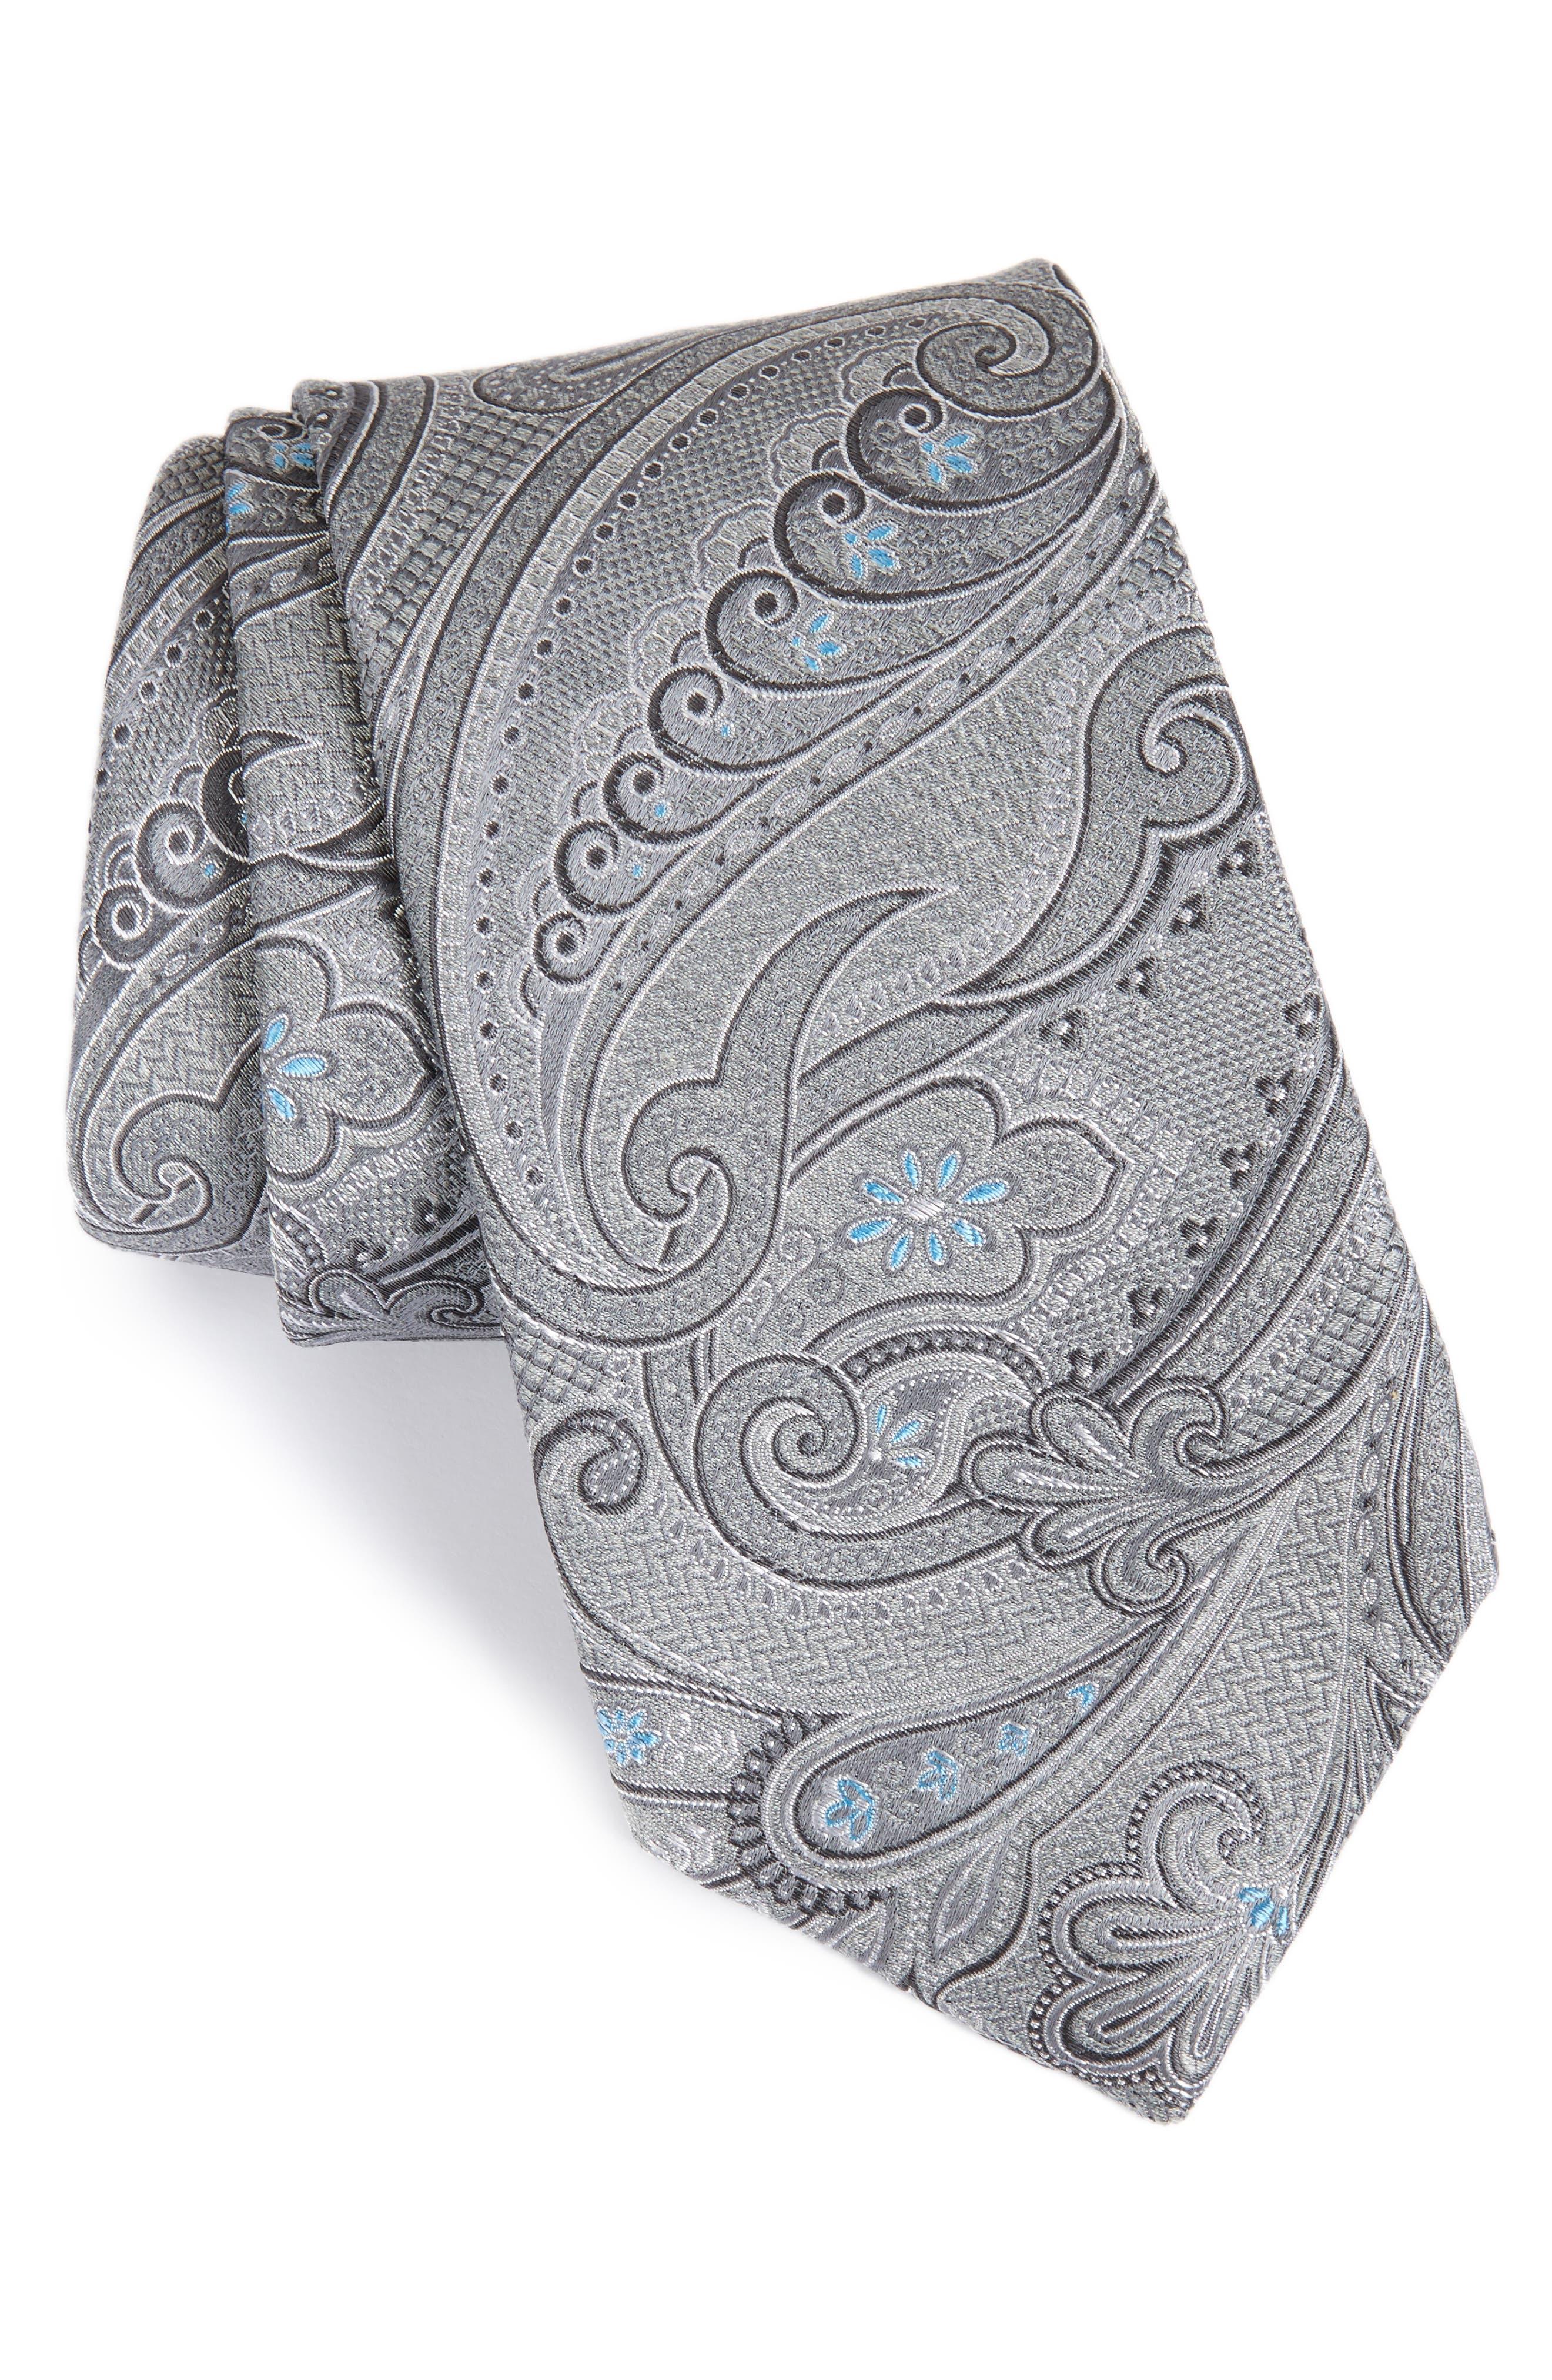 Bushnell Paisley Silk Blend Tie,                             Main thumbnail 1, color,                             CHARCOAL